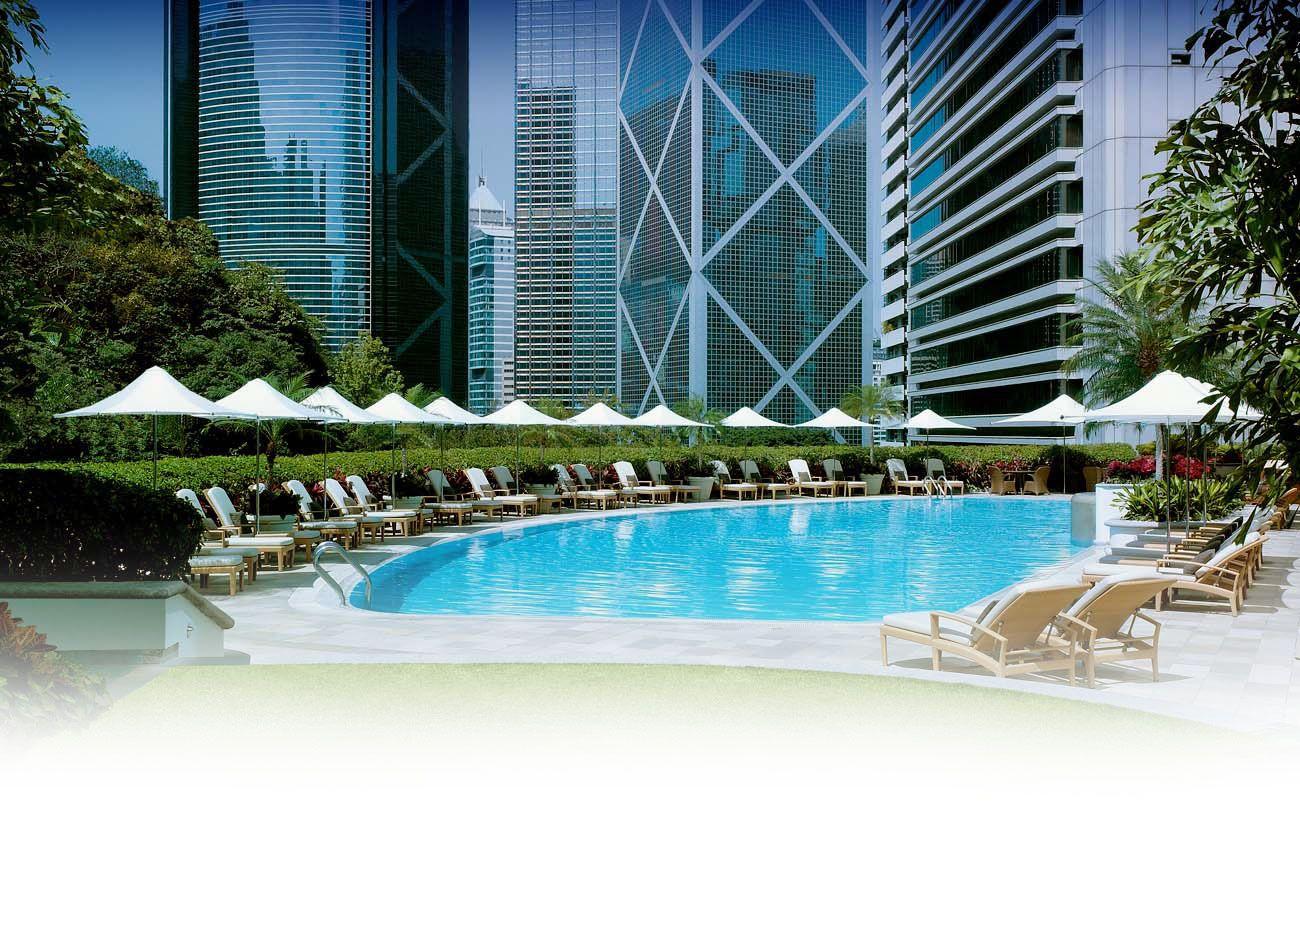 7 Five-Star Pools In Hong Kong To Enjoy This Summer